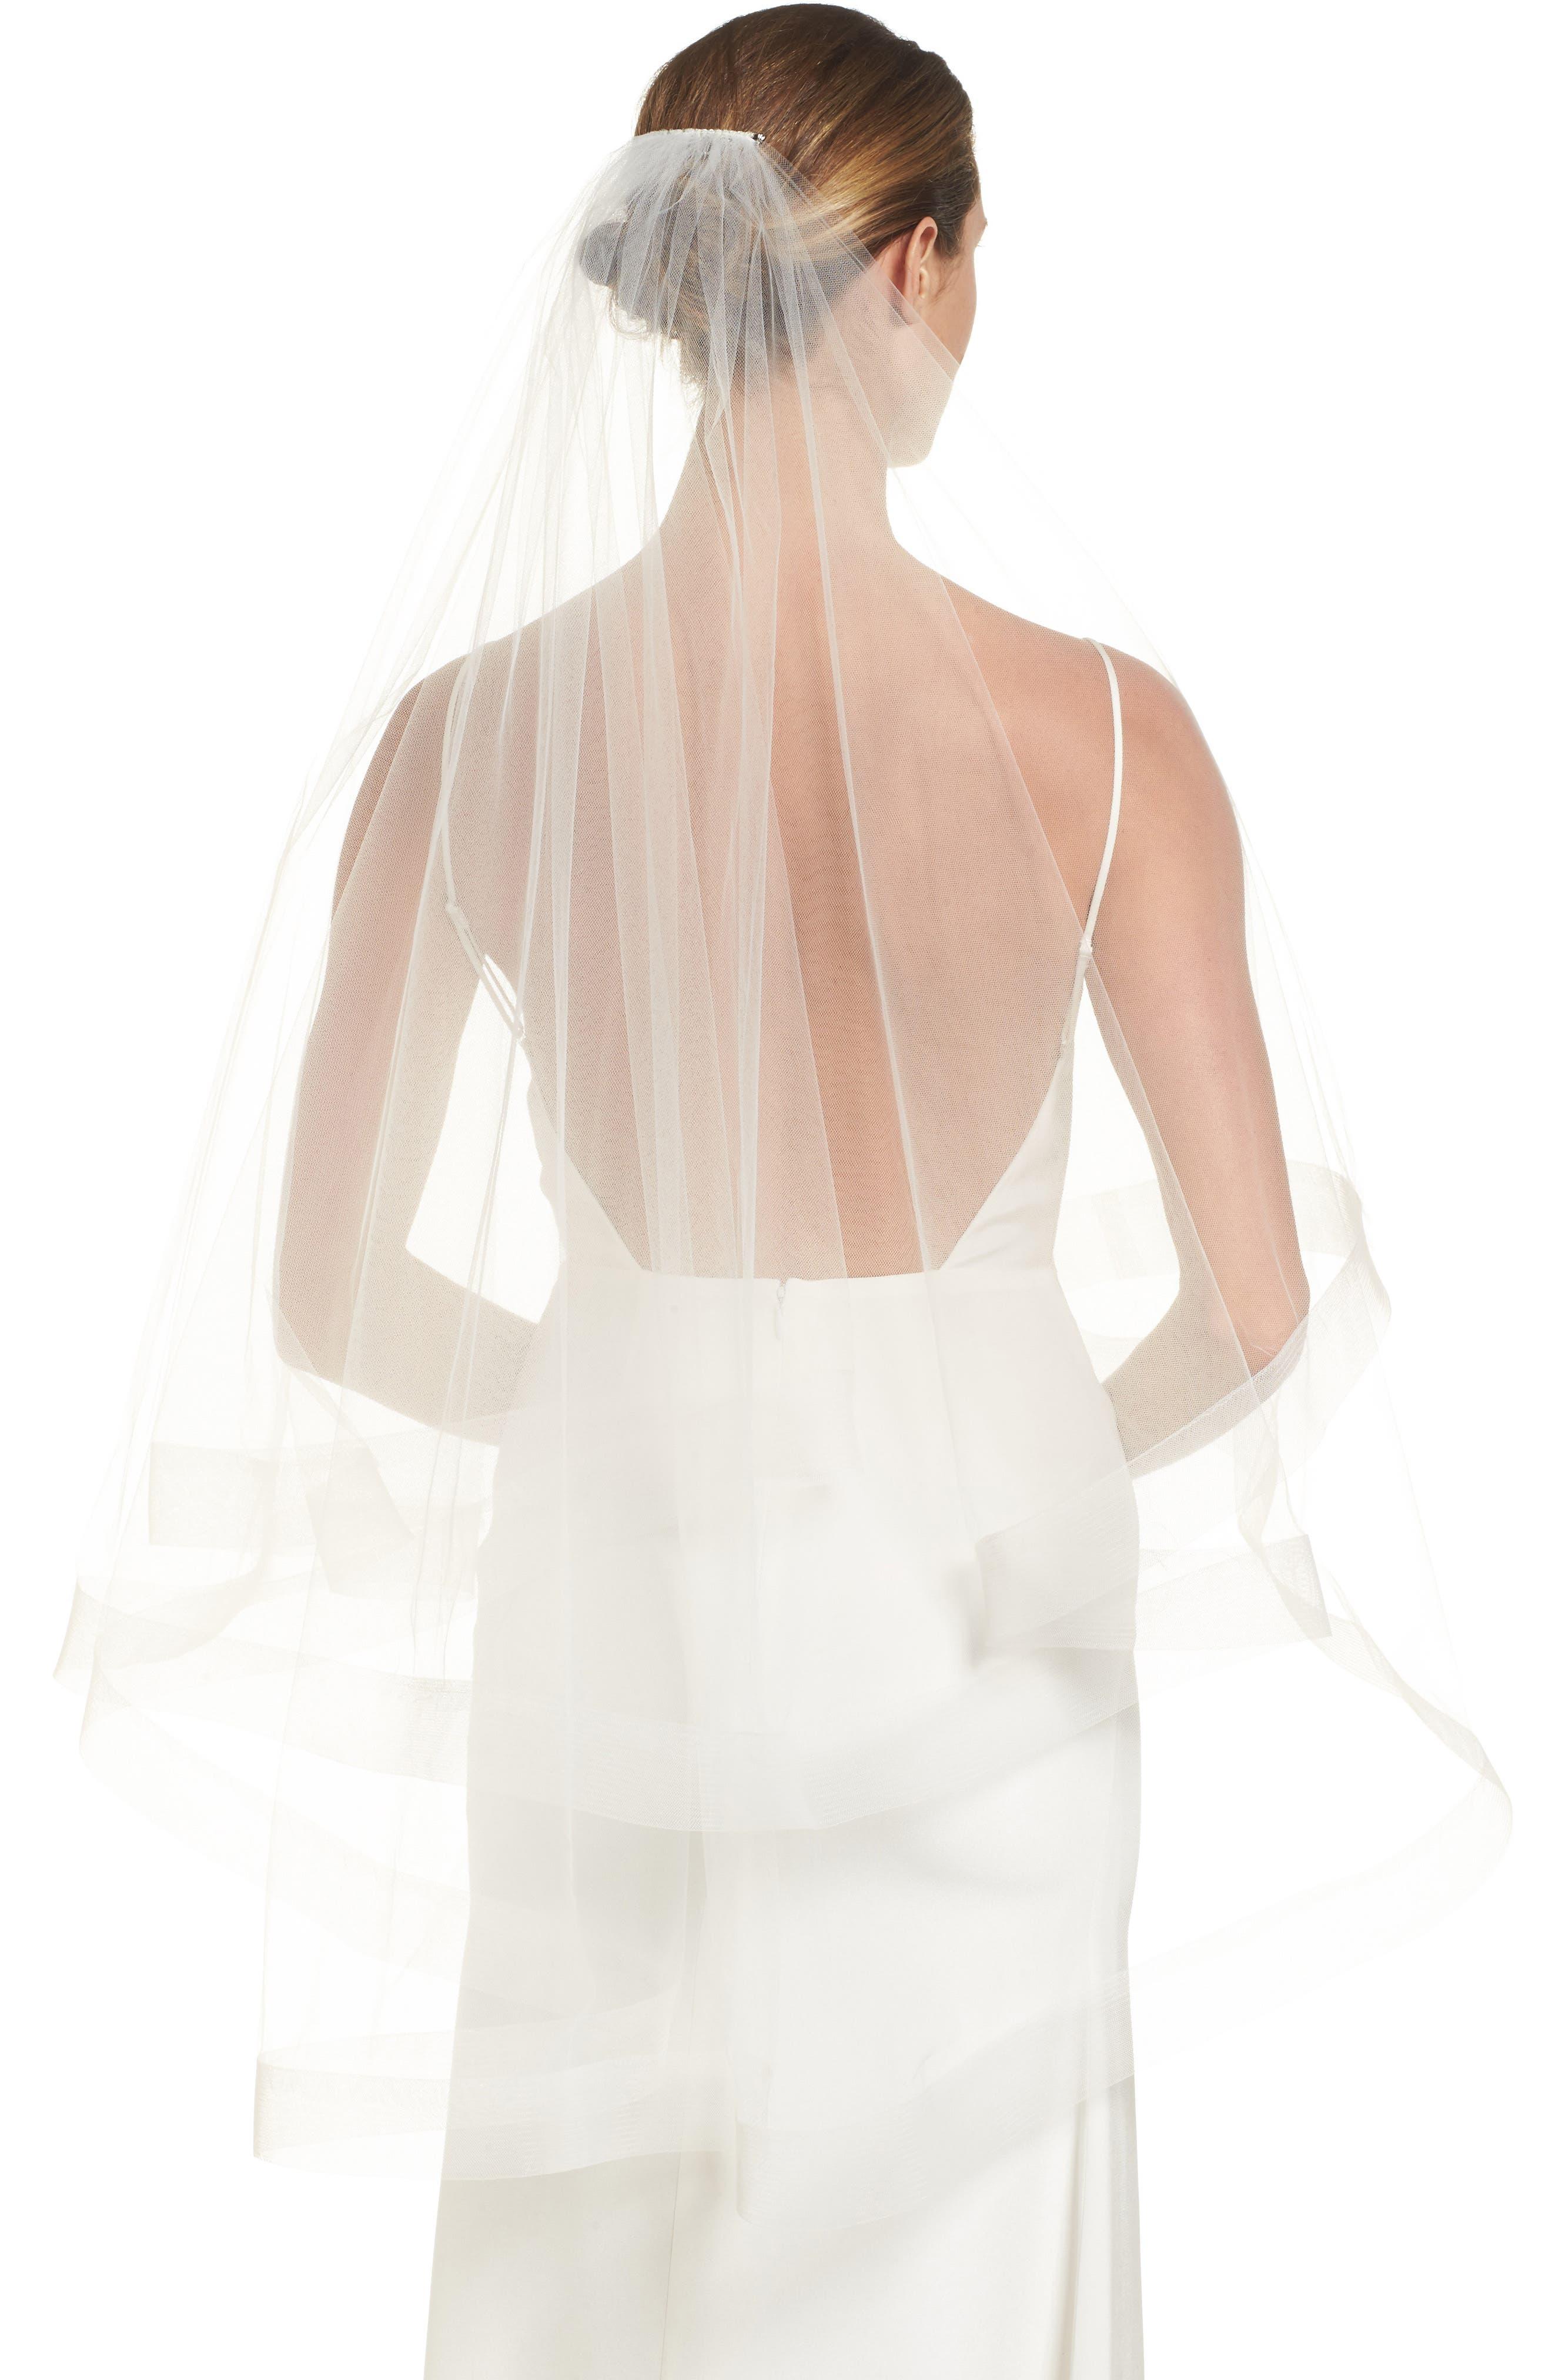 Main Image - Veil Trends Dickinson Bridal Veil